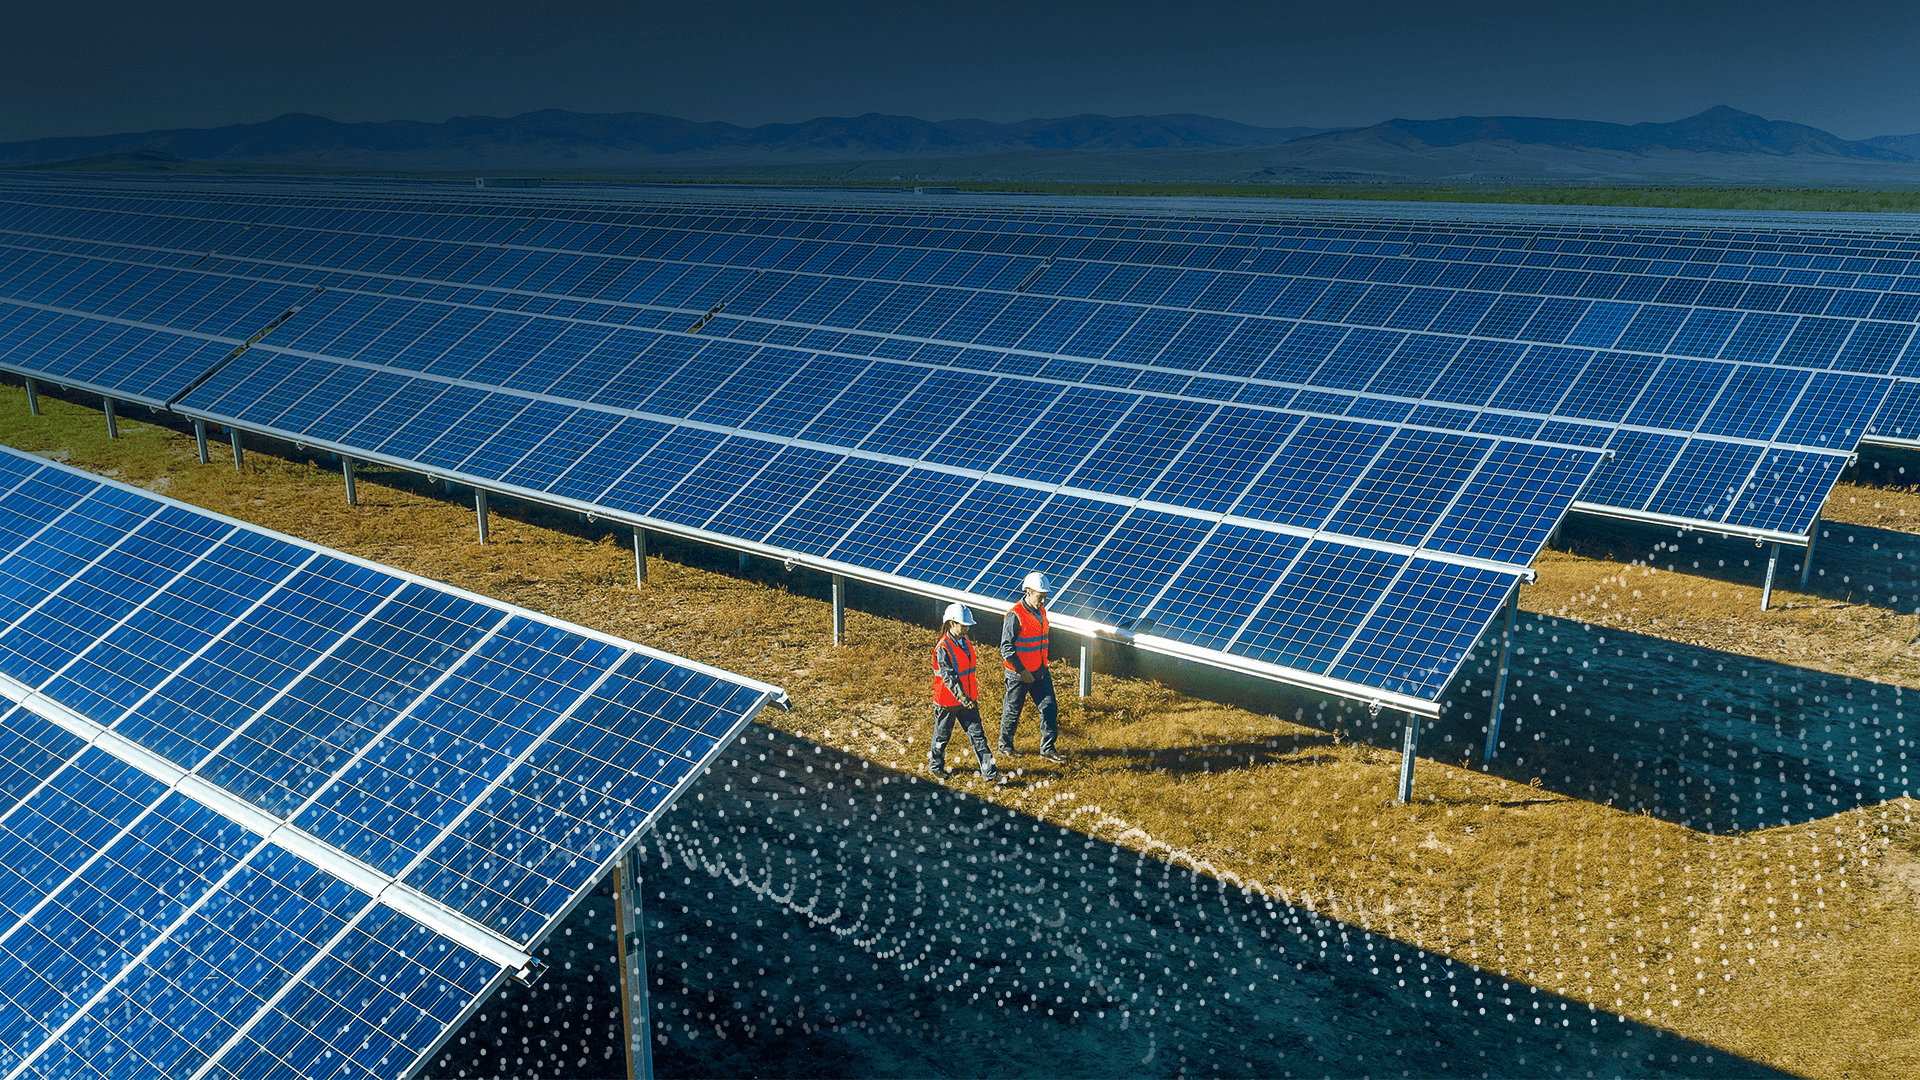 Energie, Strom, Stromversorgung, Solar, Stromnetz, Solarzelle, Solarenergie, Solarpanel, Photovoltaik, Solarzellen, Solarmodul, Solarstrom, Solarpark, Solaranlage, SolarCity, Solarfeld, Sonnenenergie